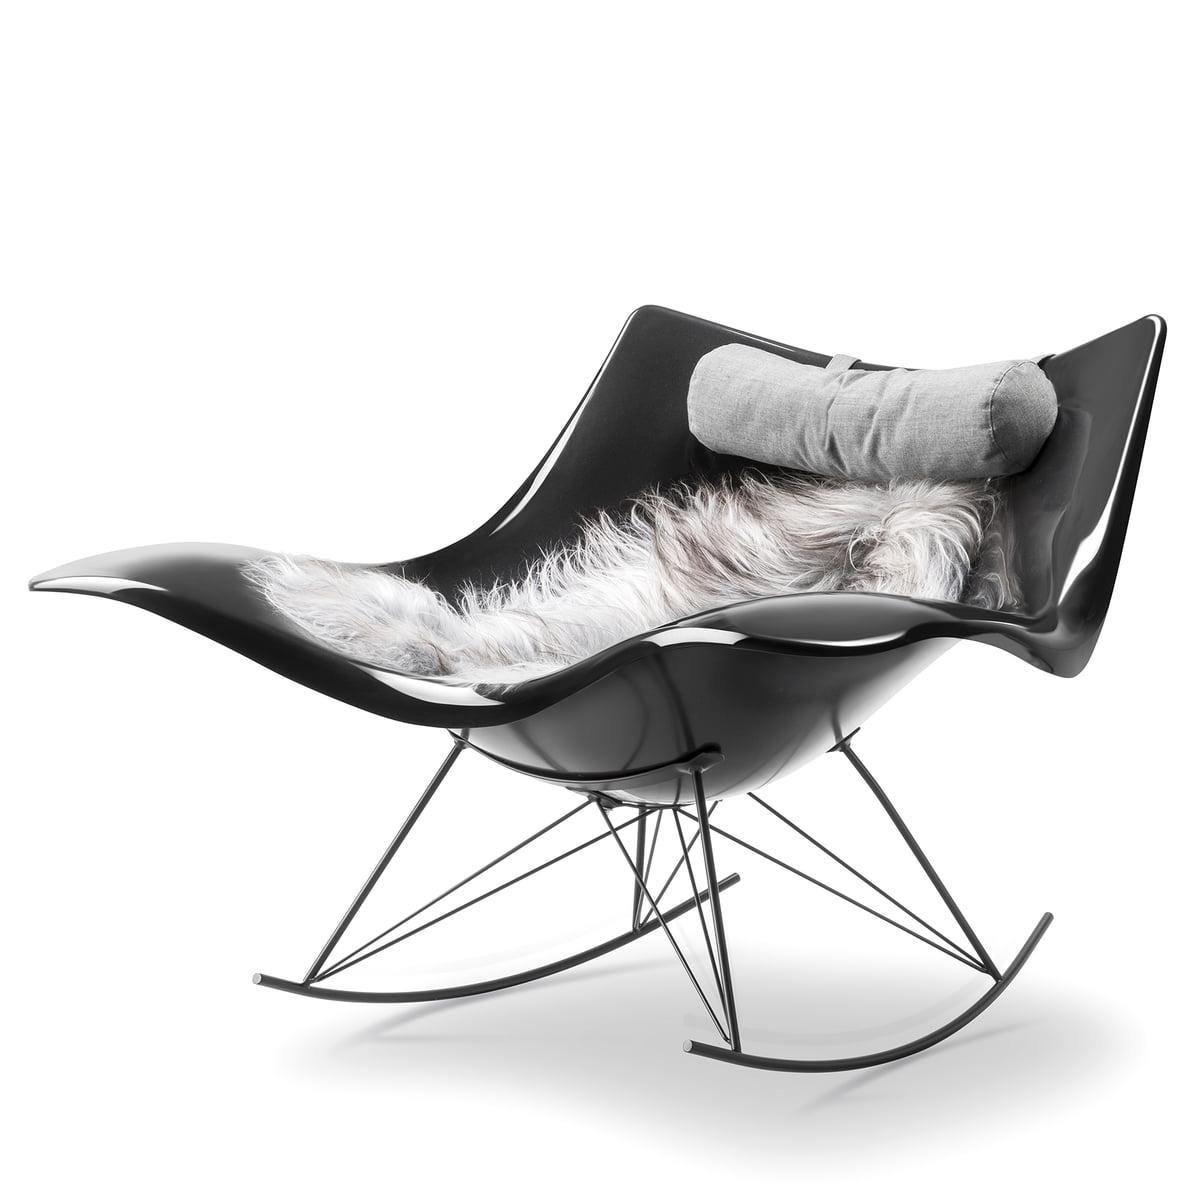 stingray schaukelstuhl von fredericia im shop. Black Bedroom Furniture Sets. Home Design Ideas